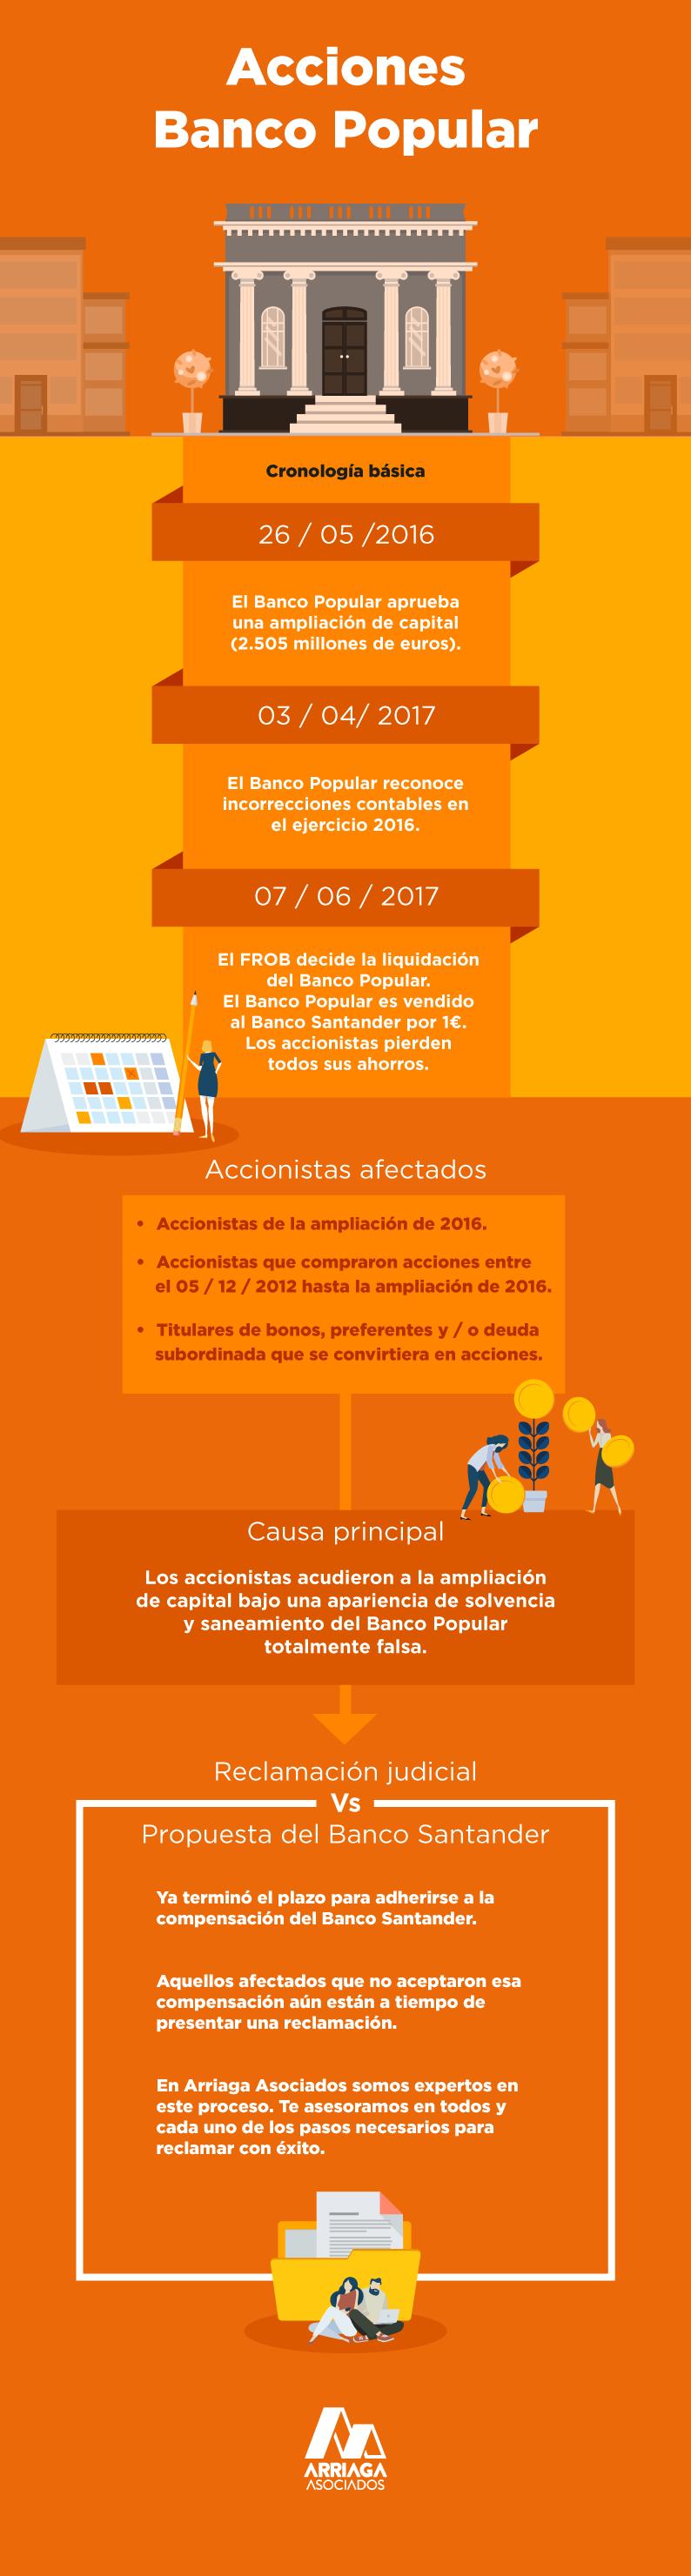 infografia-acciones-popular